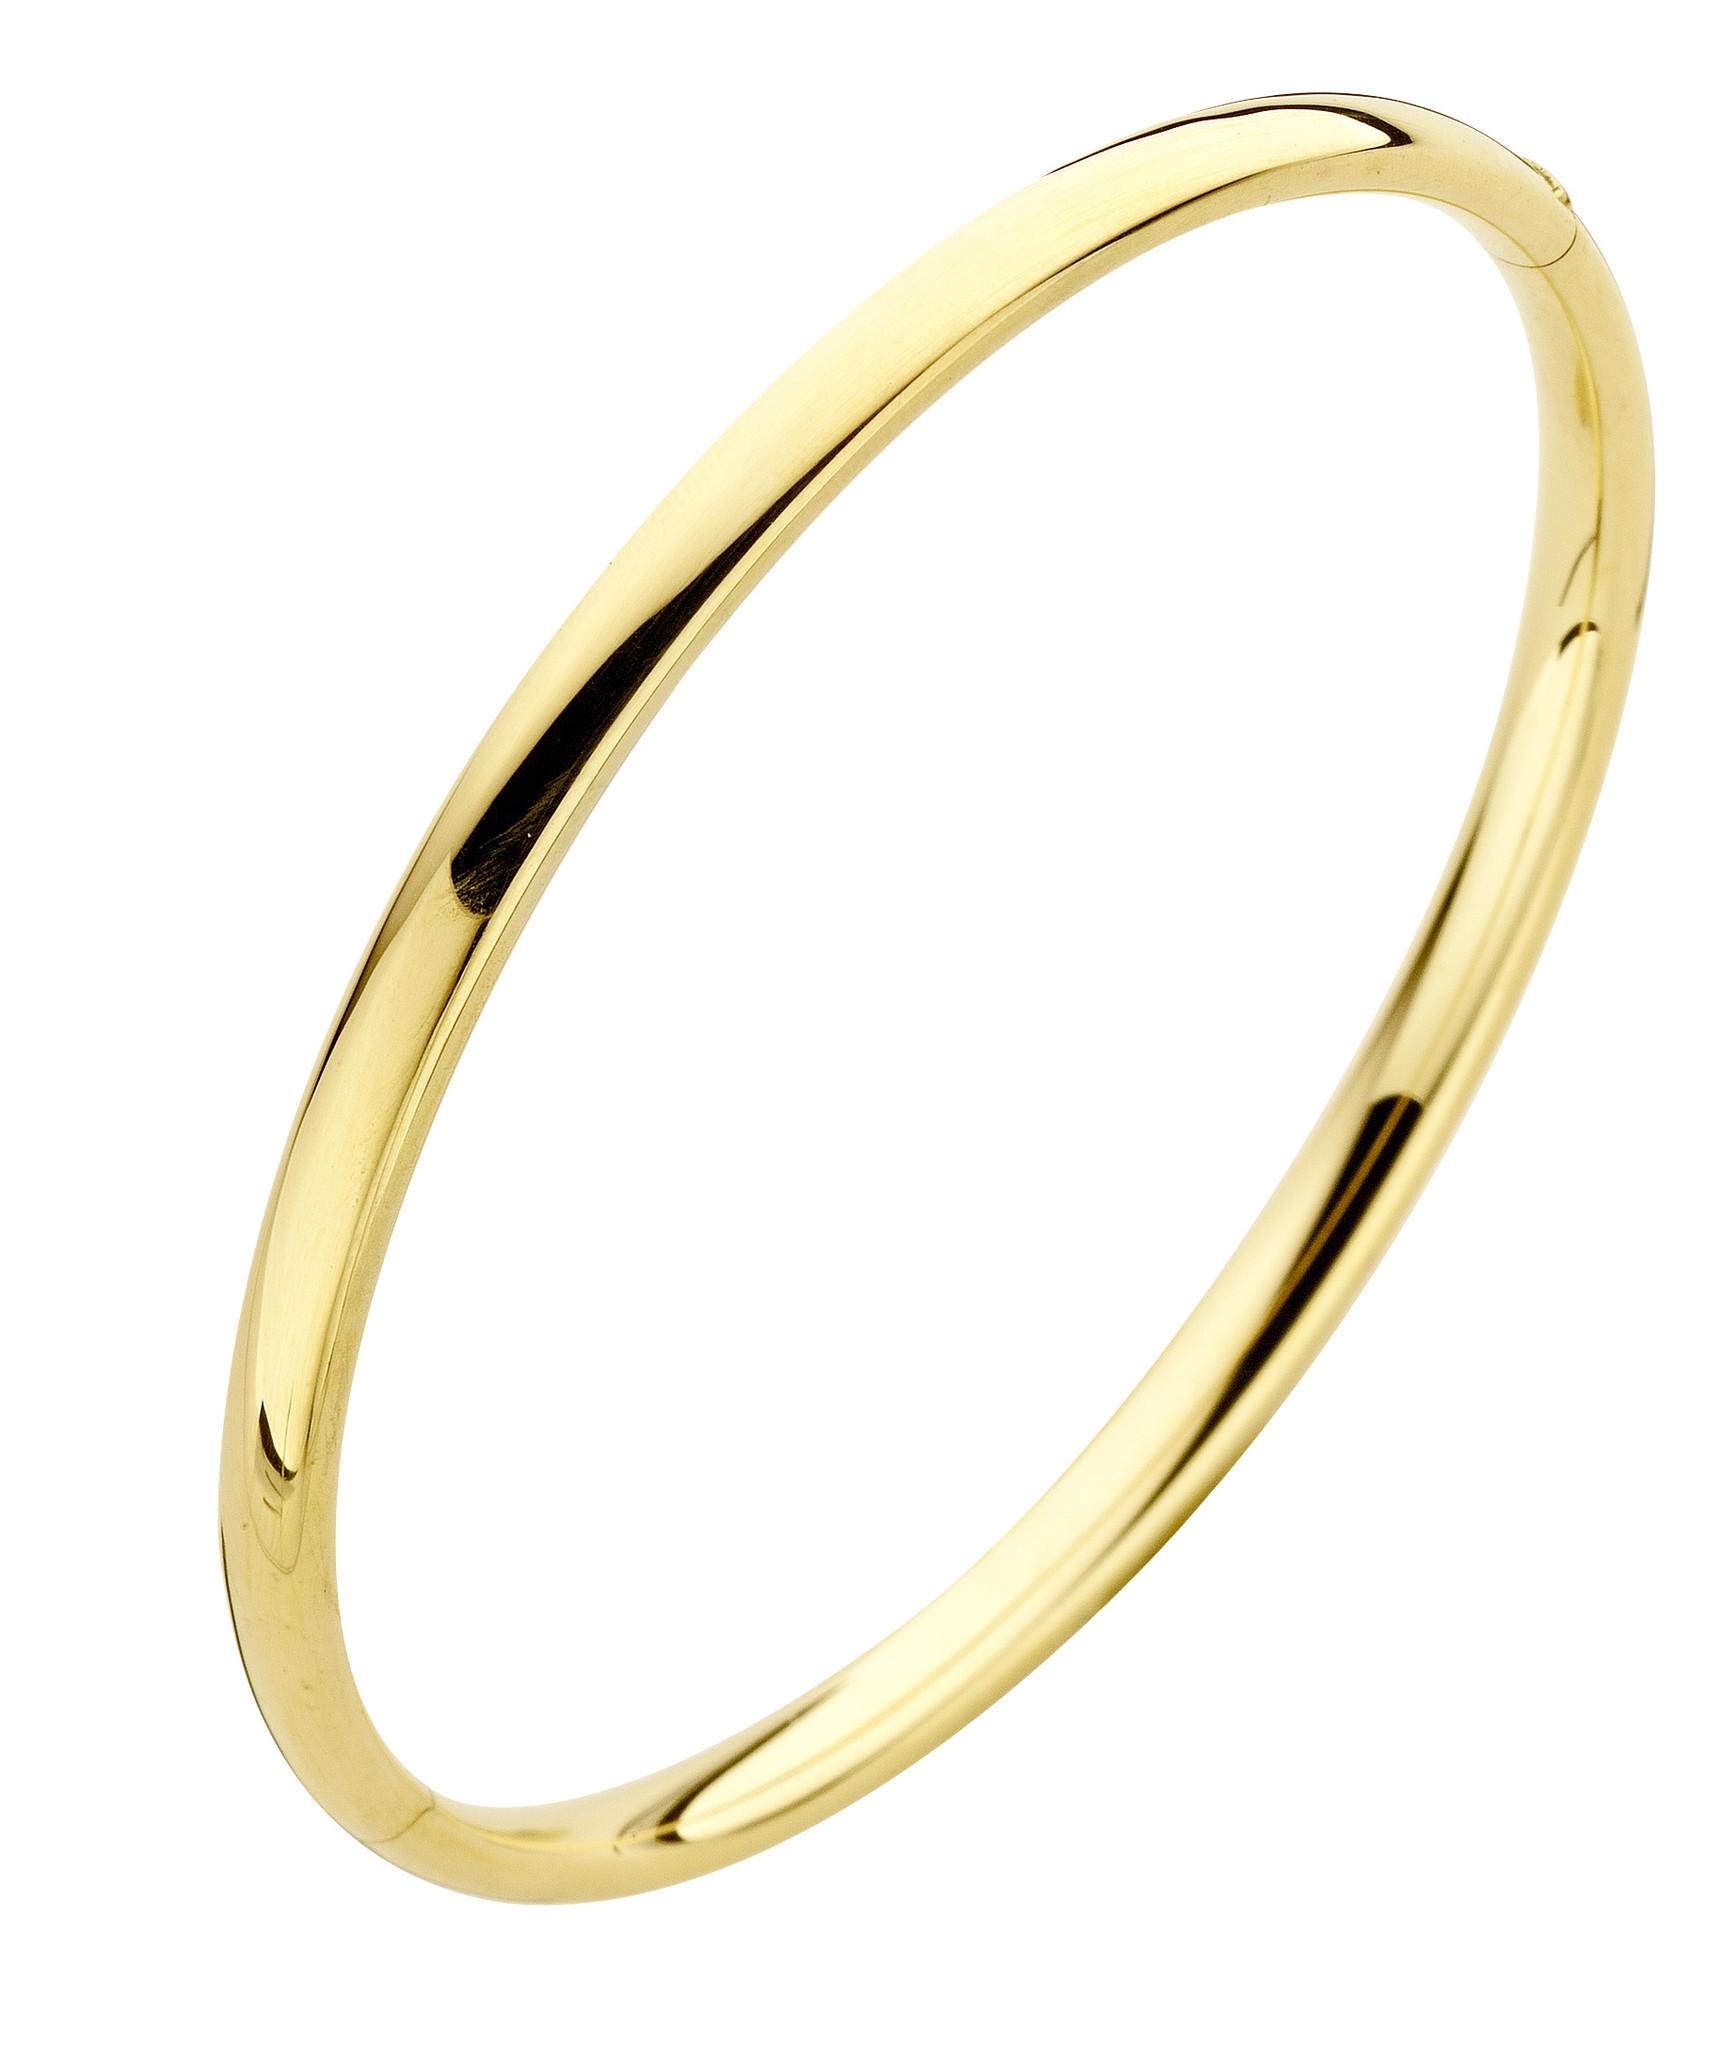 14 karaat geelgouden armband - Rond 4 mm - Fjory - Slavenarmband-1